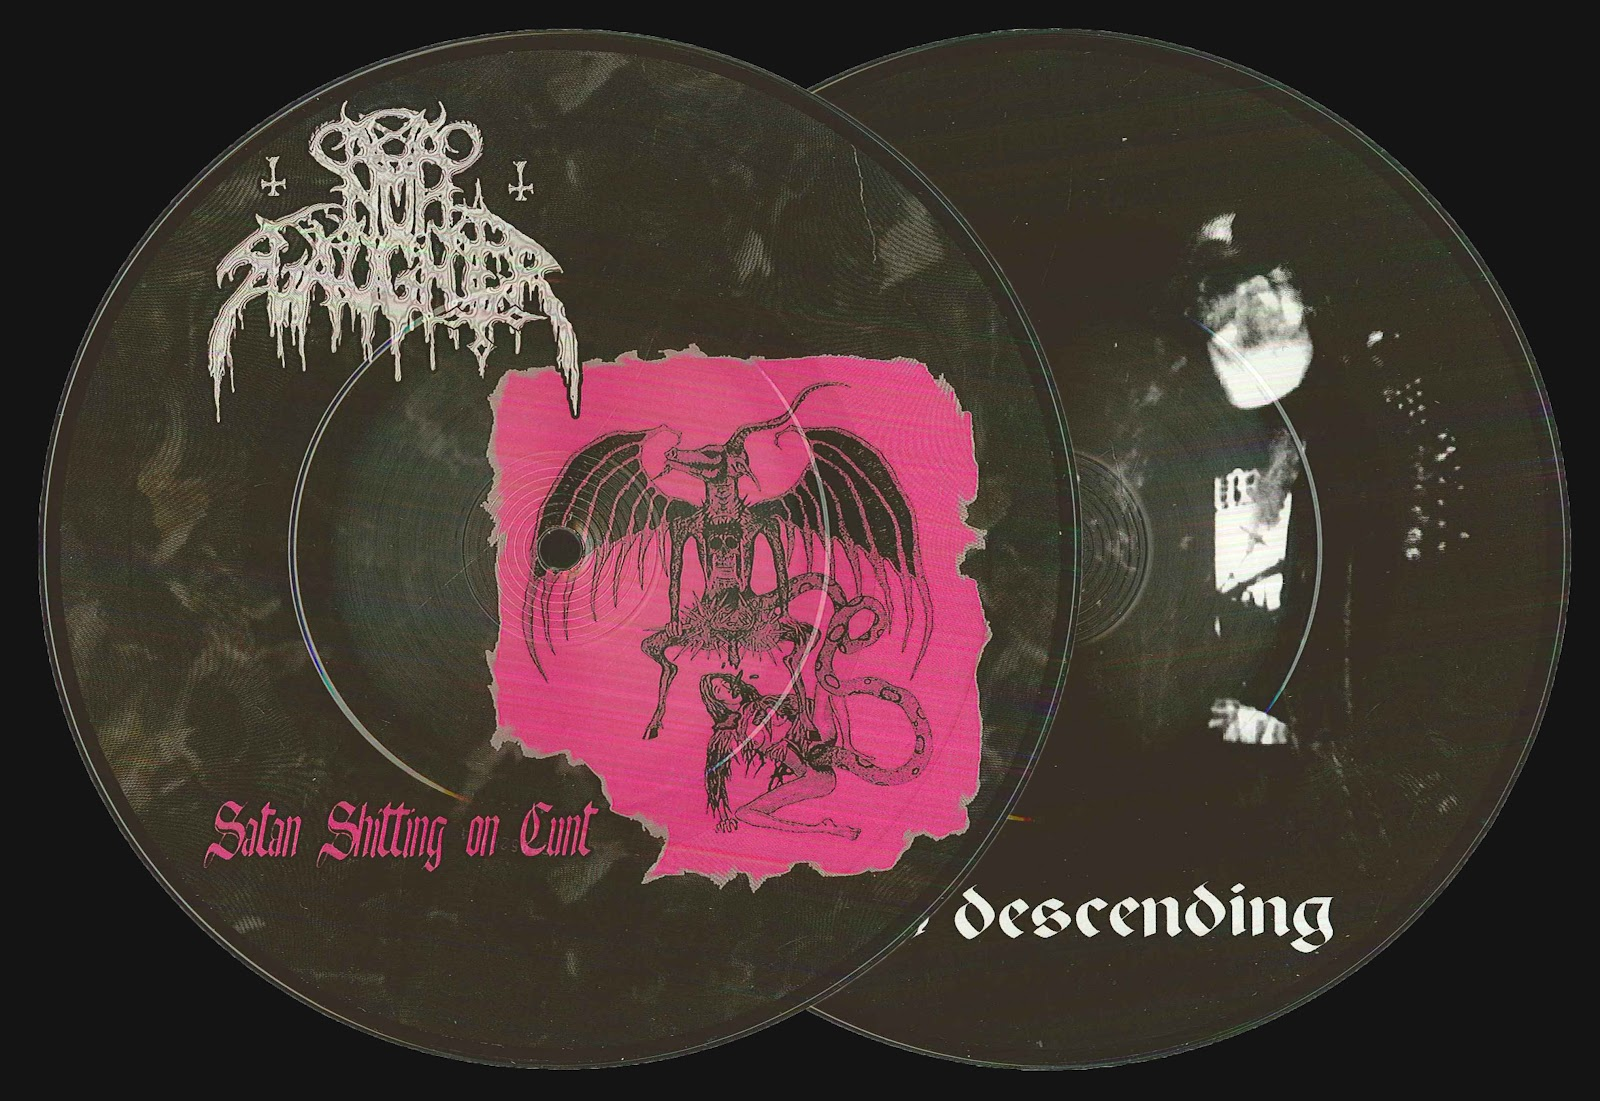 NunSlaughter / Krieg - Satan Shitting On Cunt / Flesh Descending